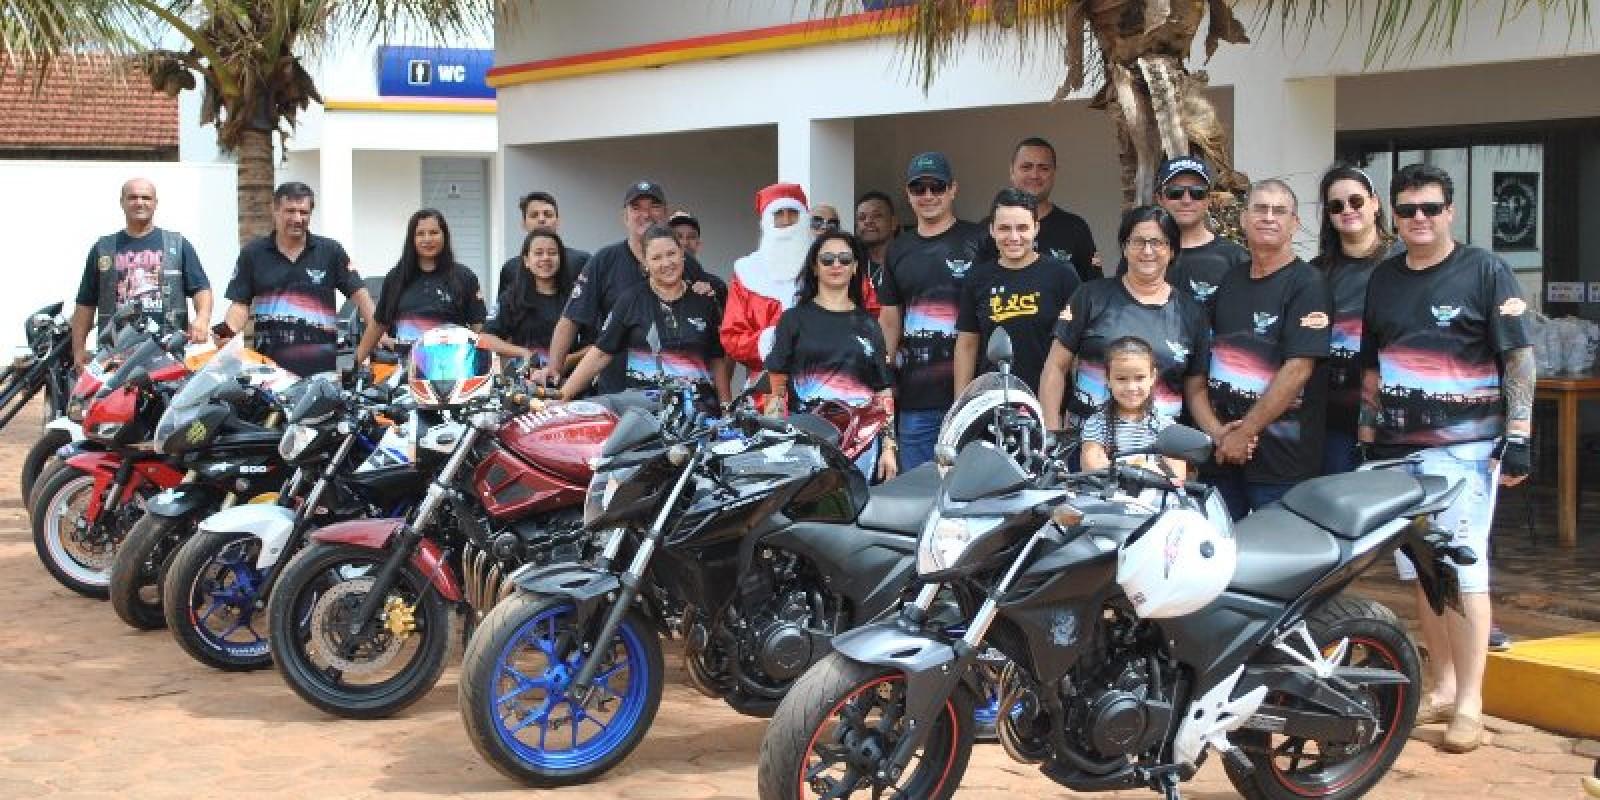 Confira todas as fotos da entrega de balas realizada pelo Moto Clube Rota 141